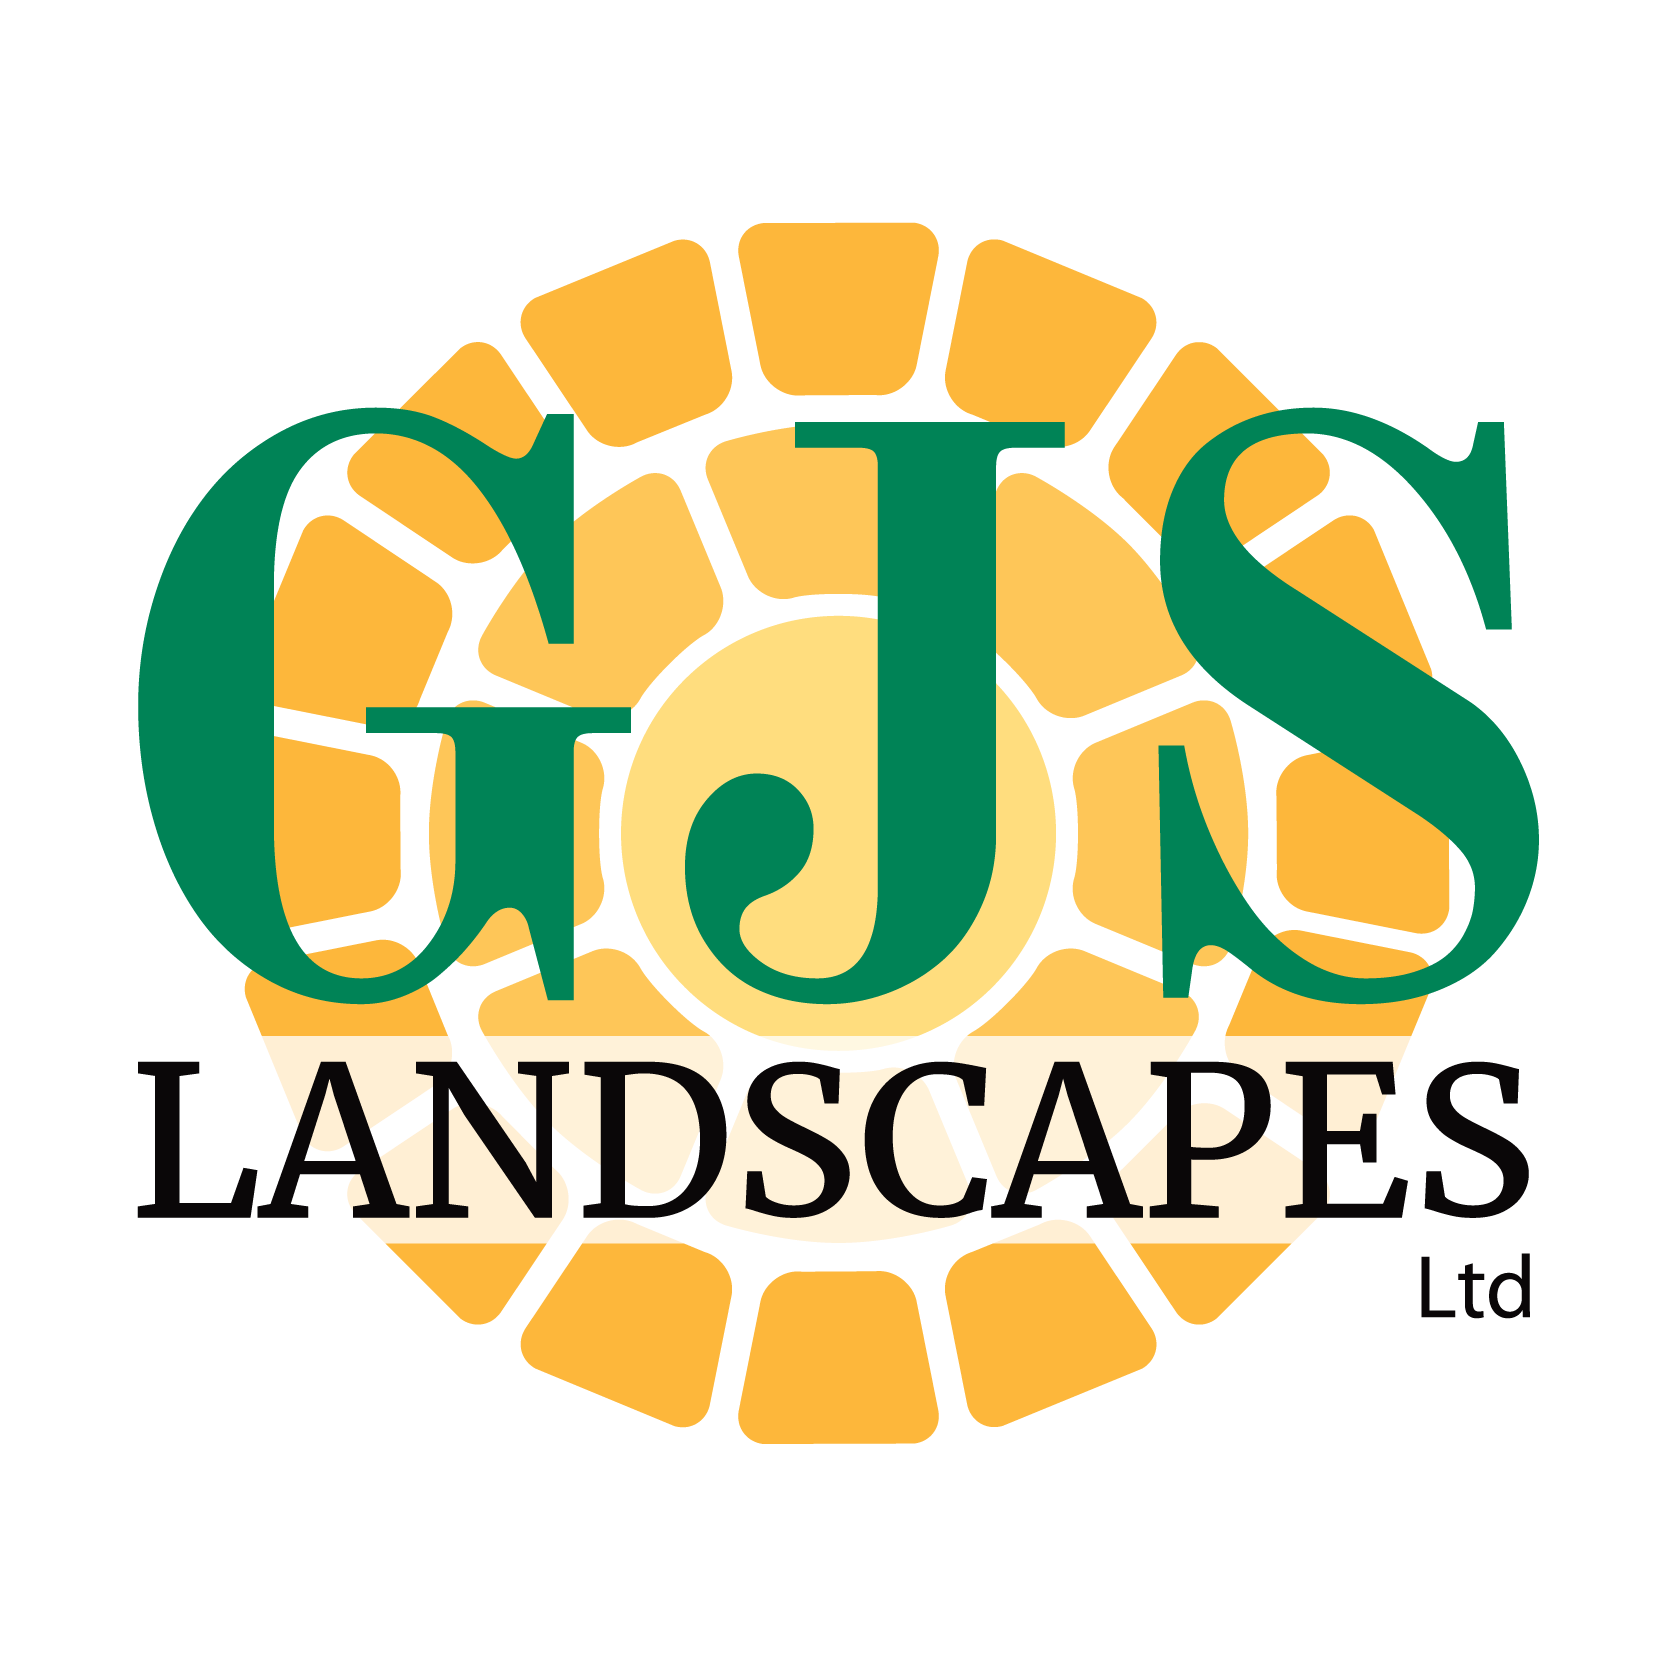 How to find GJS Landscapes Ltd., Unit 8,, The Parade Ground, Boundary Way, Yeovil,, Somerset,, BA22 8HZ, UK